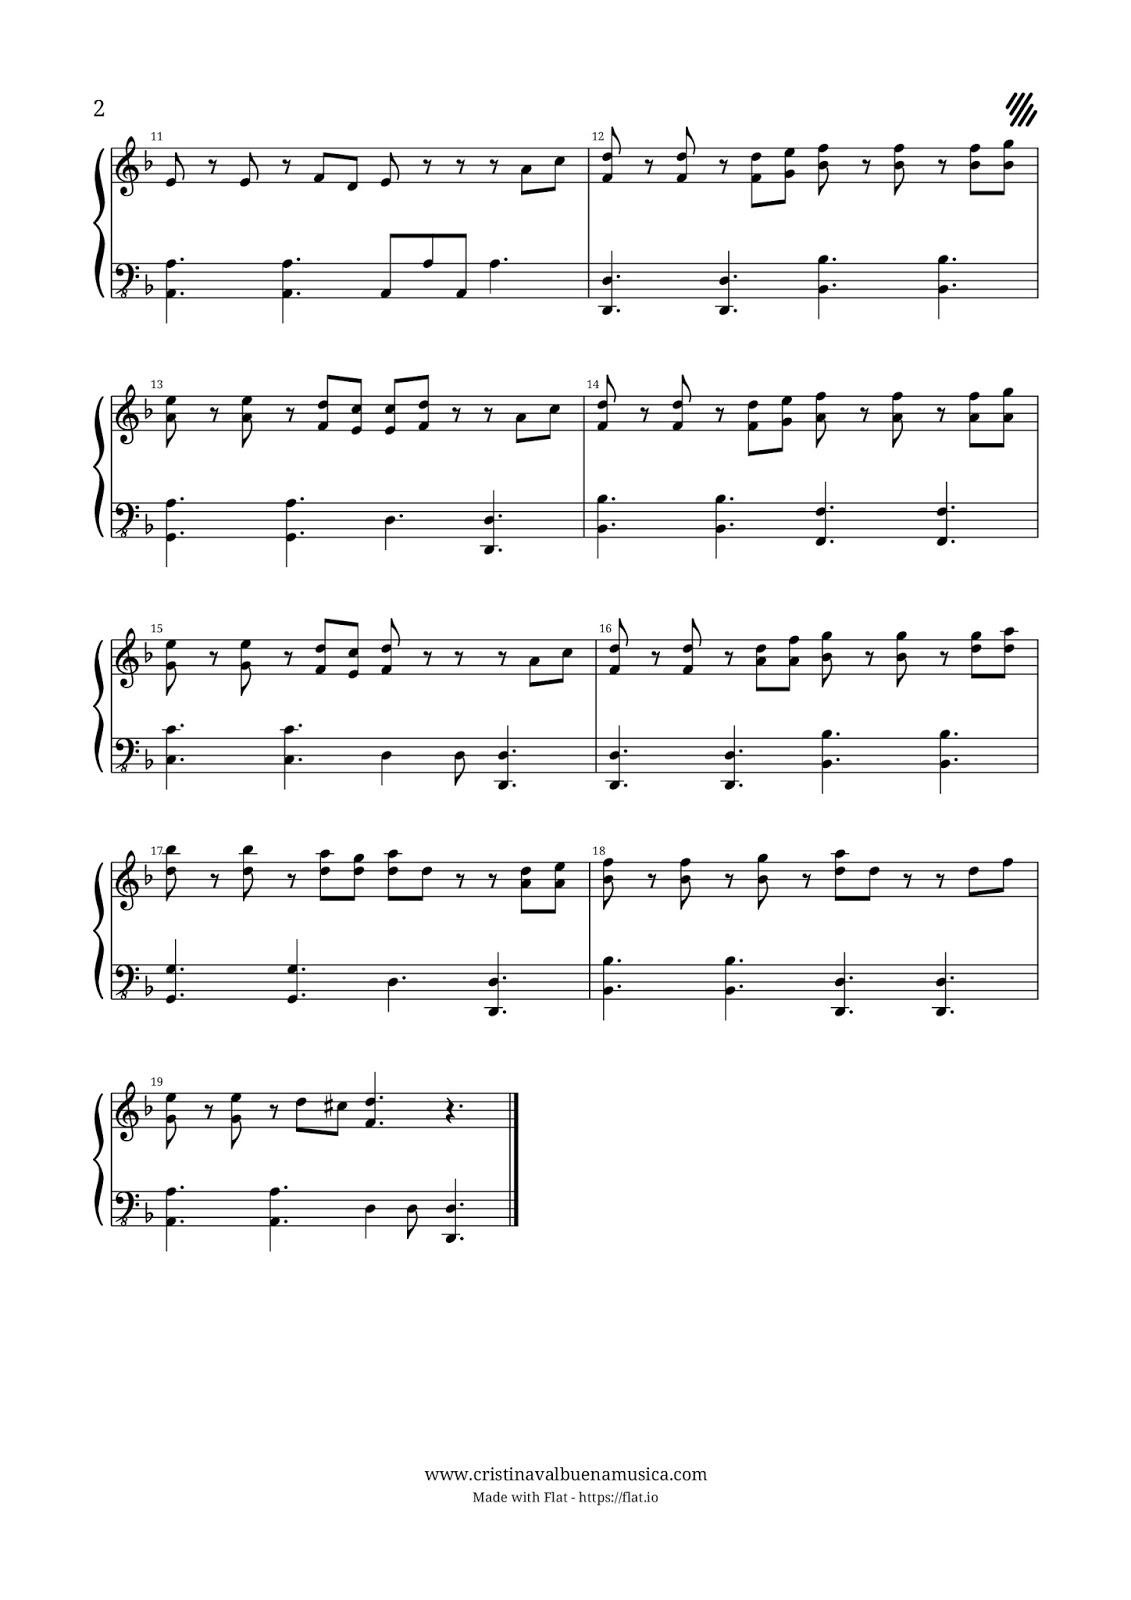 Partitura Facil Para Piano Bso Piratas Del Caribe He S A Pirate